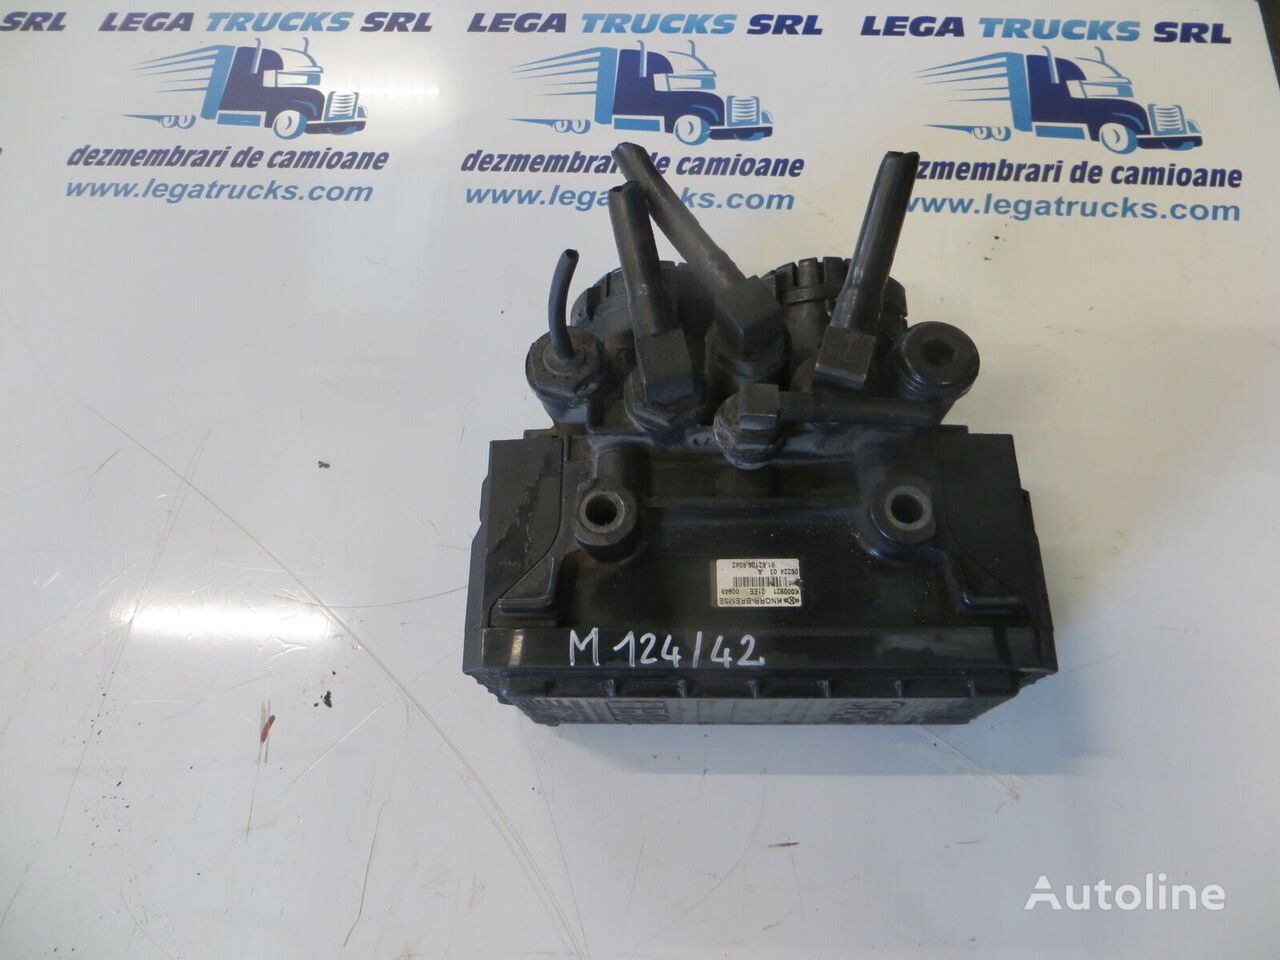 MAN 81521066042 / M124/42 (81521066042) válvula neumática para MAN TGA 430, 2006, euro 4  tractora